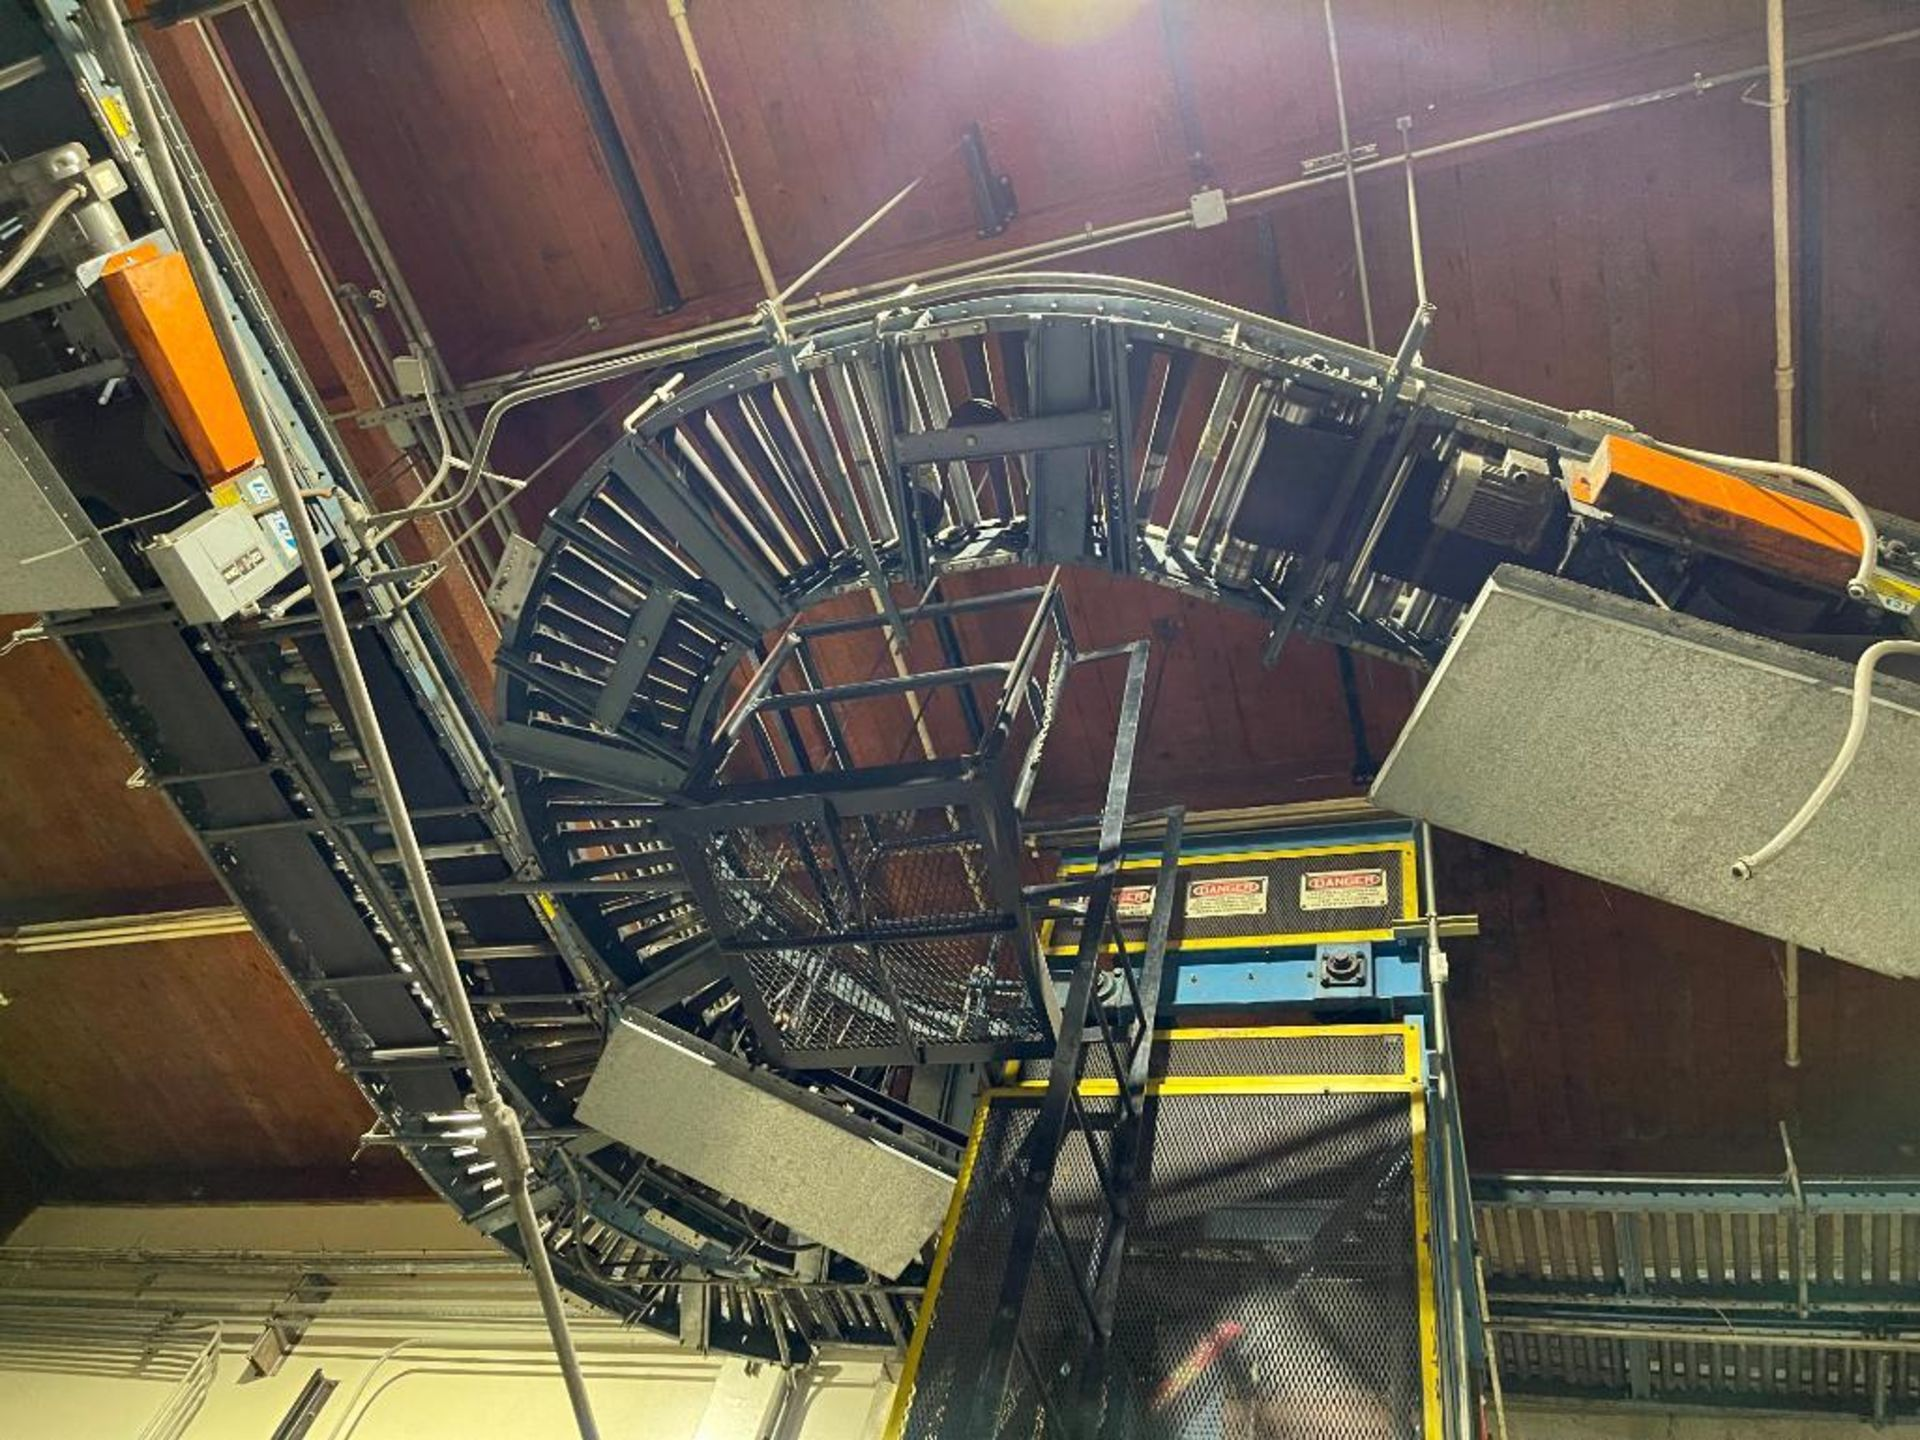 overhead power case conveyor - Image 3 of 9